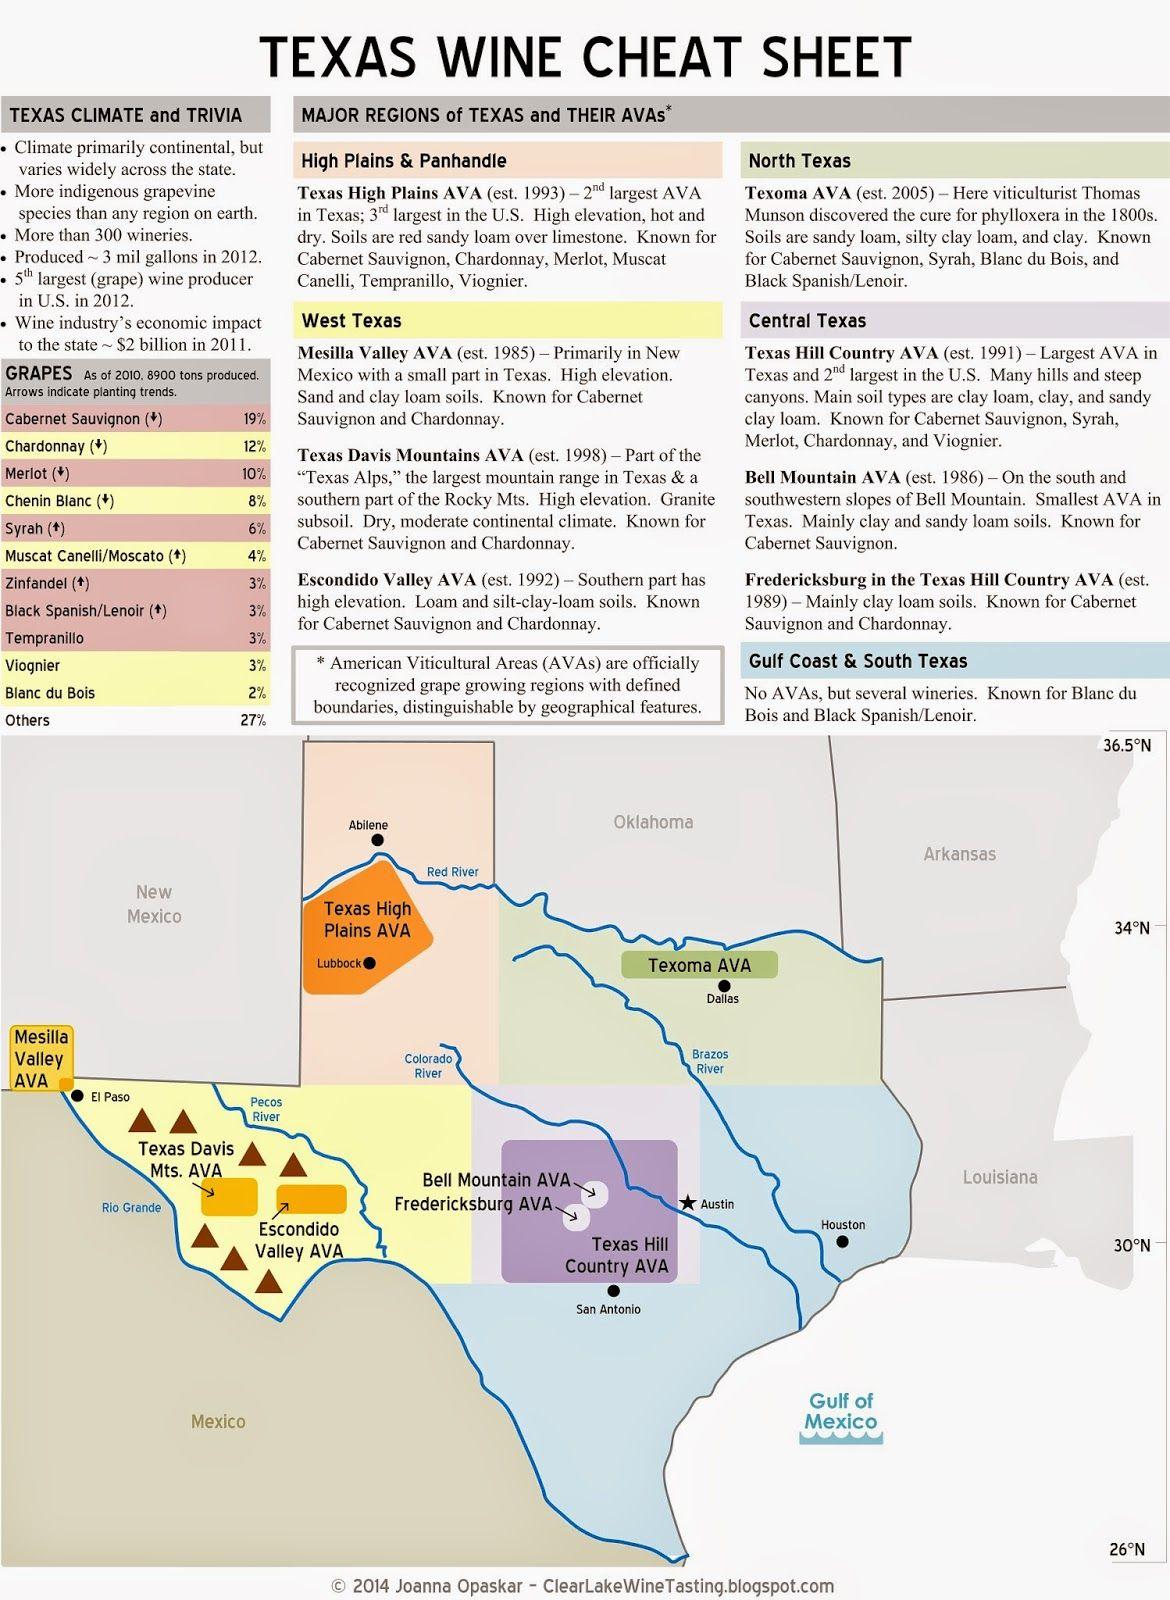 Map Of Texas Wineries.Clear Lake Wine Tasting Texas Wine Cheat Wine Wineeducation